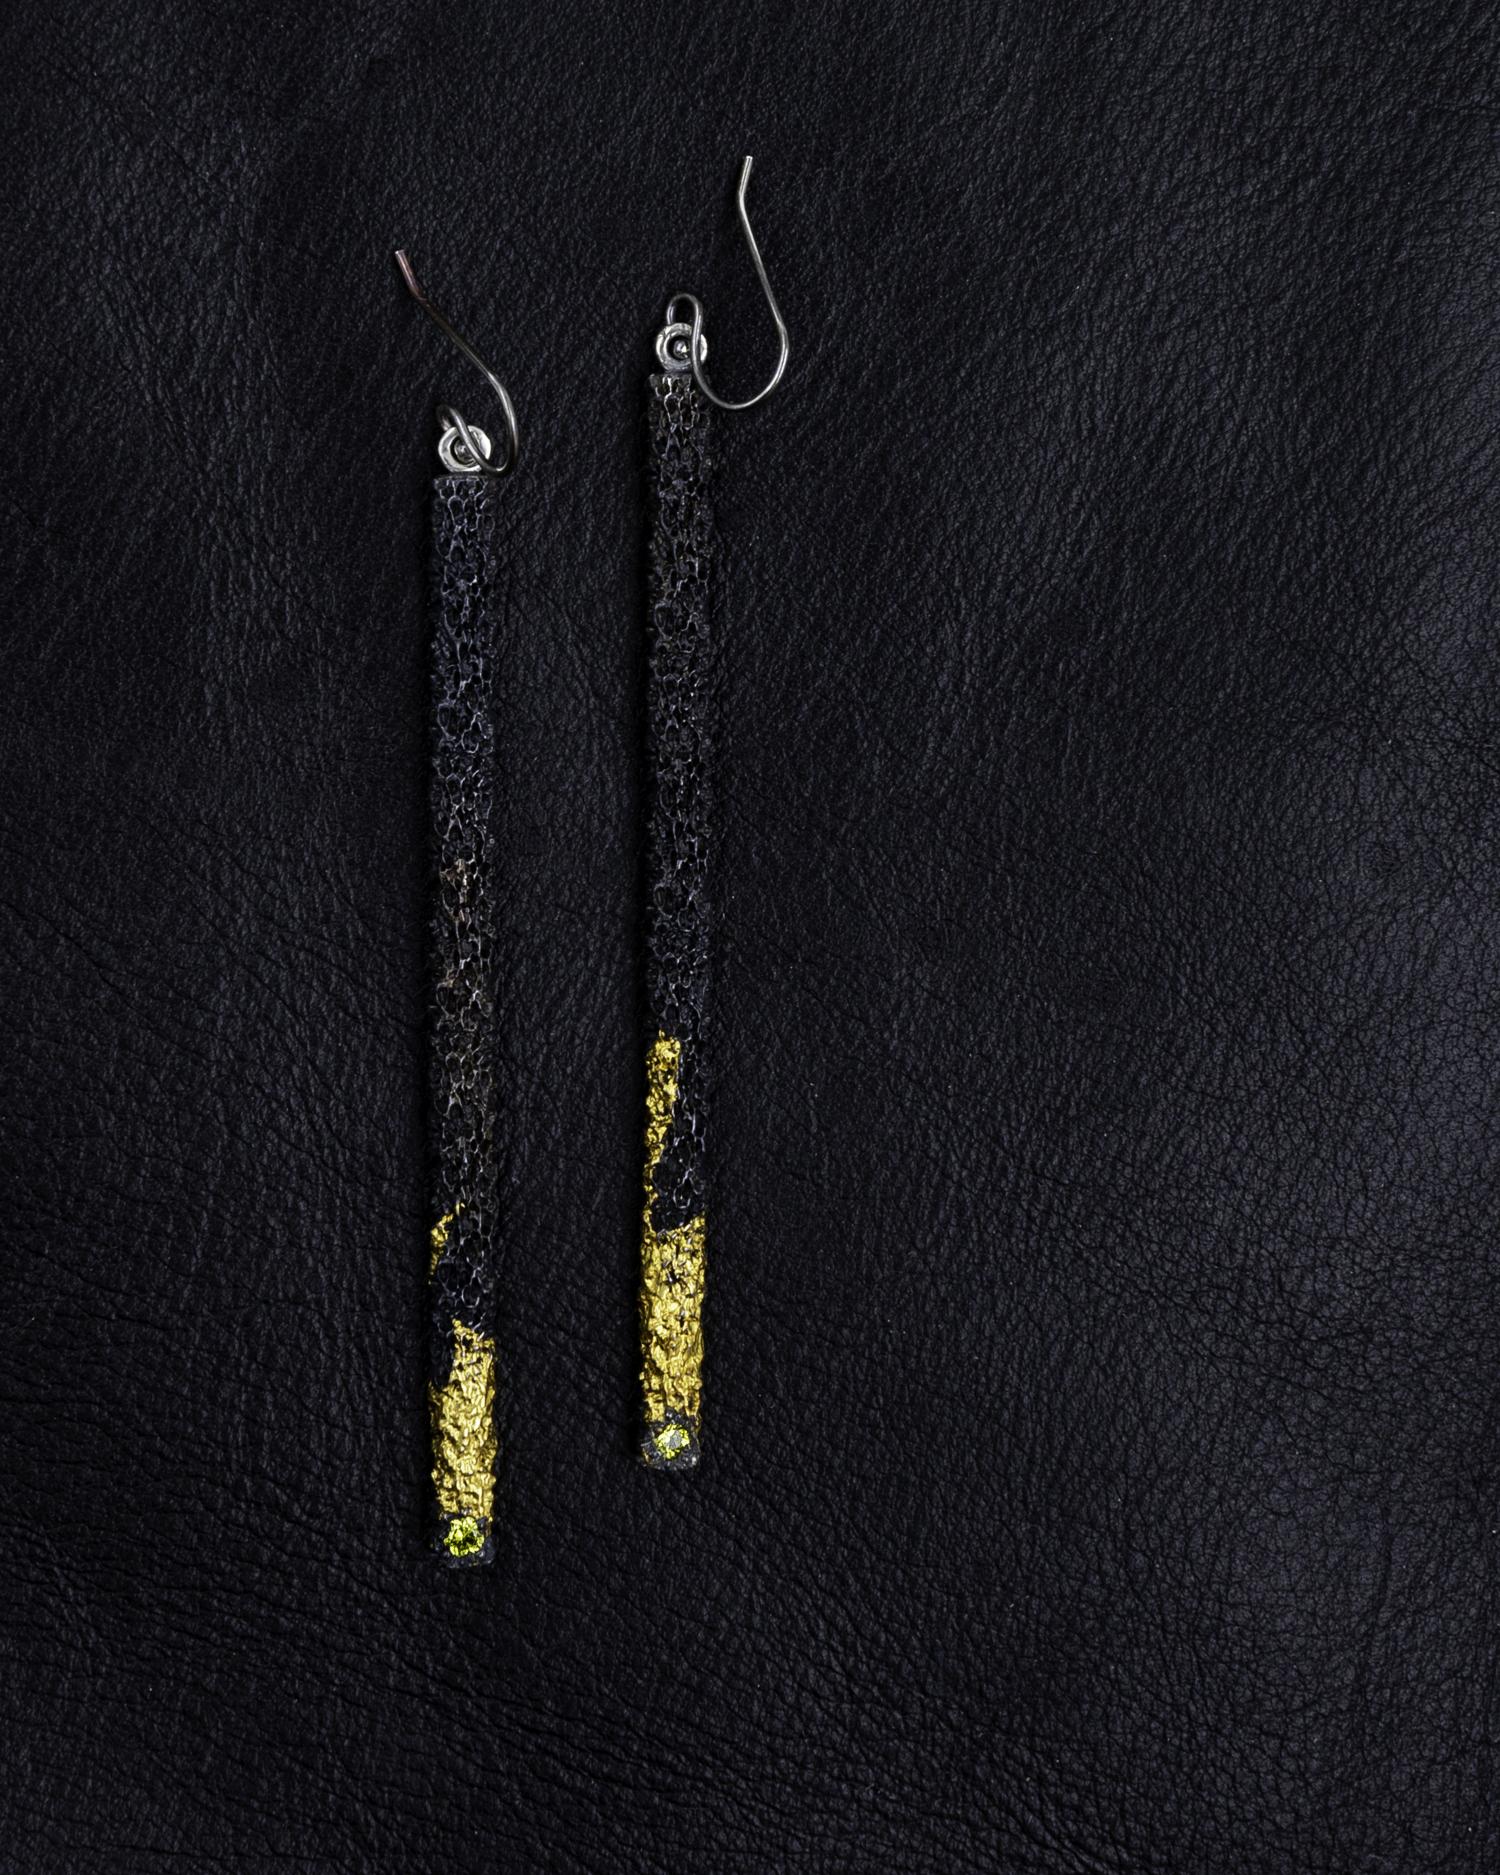 Graceful Inner Island Long Column Earrings |  Sterling silver, keum-boo 24ct gold, yellow Australian sapphires.